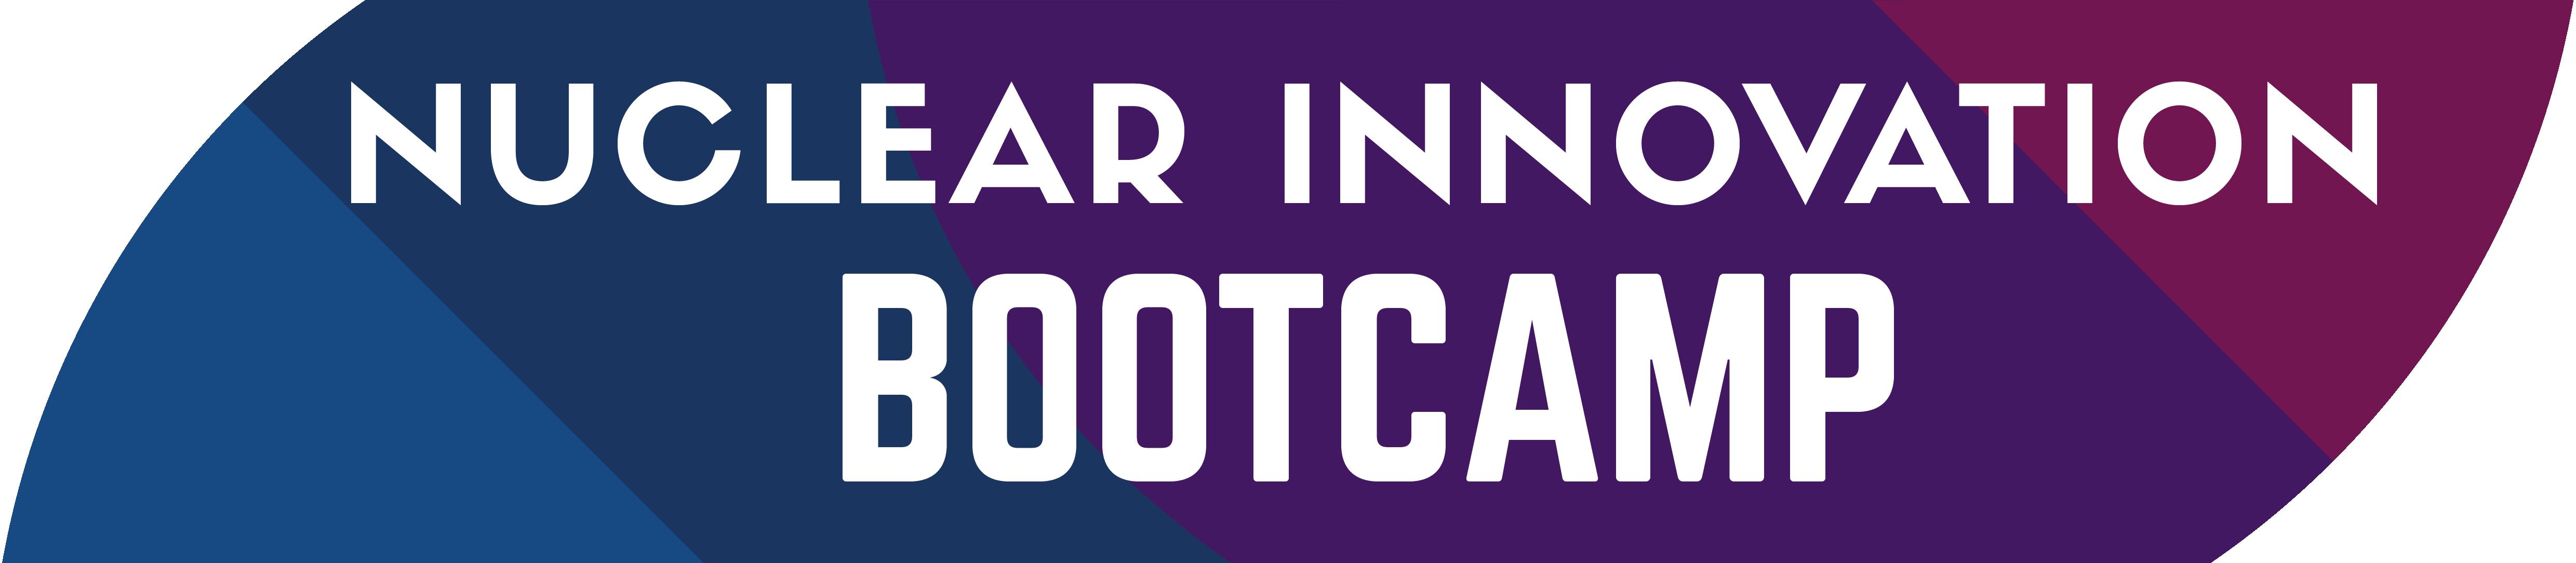 Nuclear Innovation Bootcamp